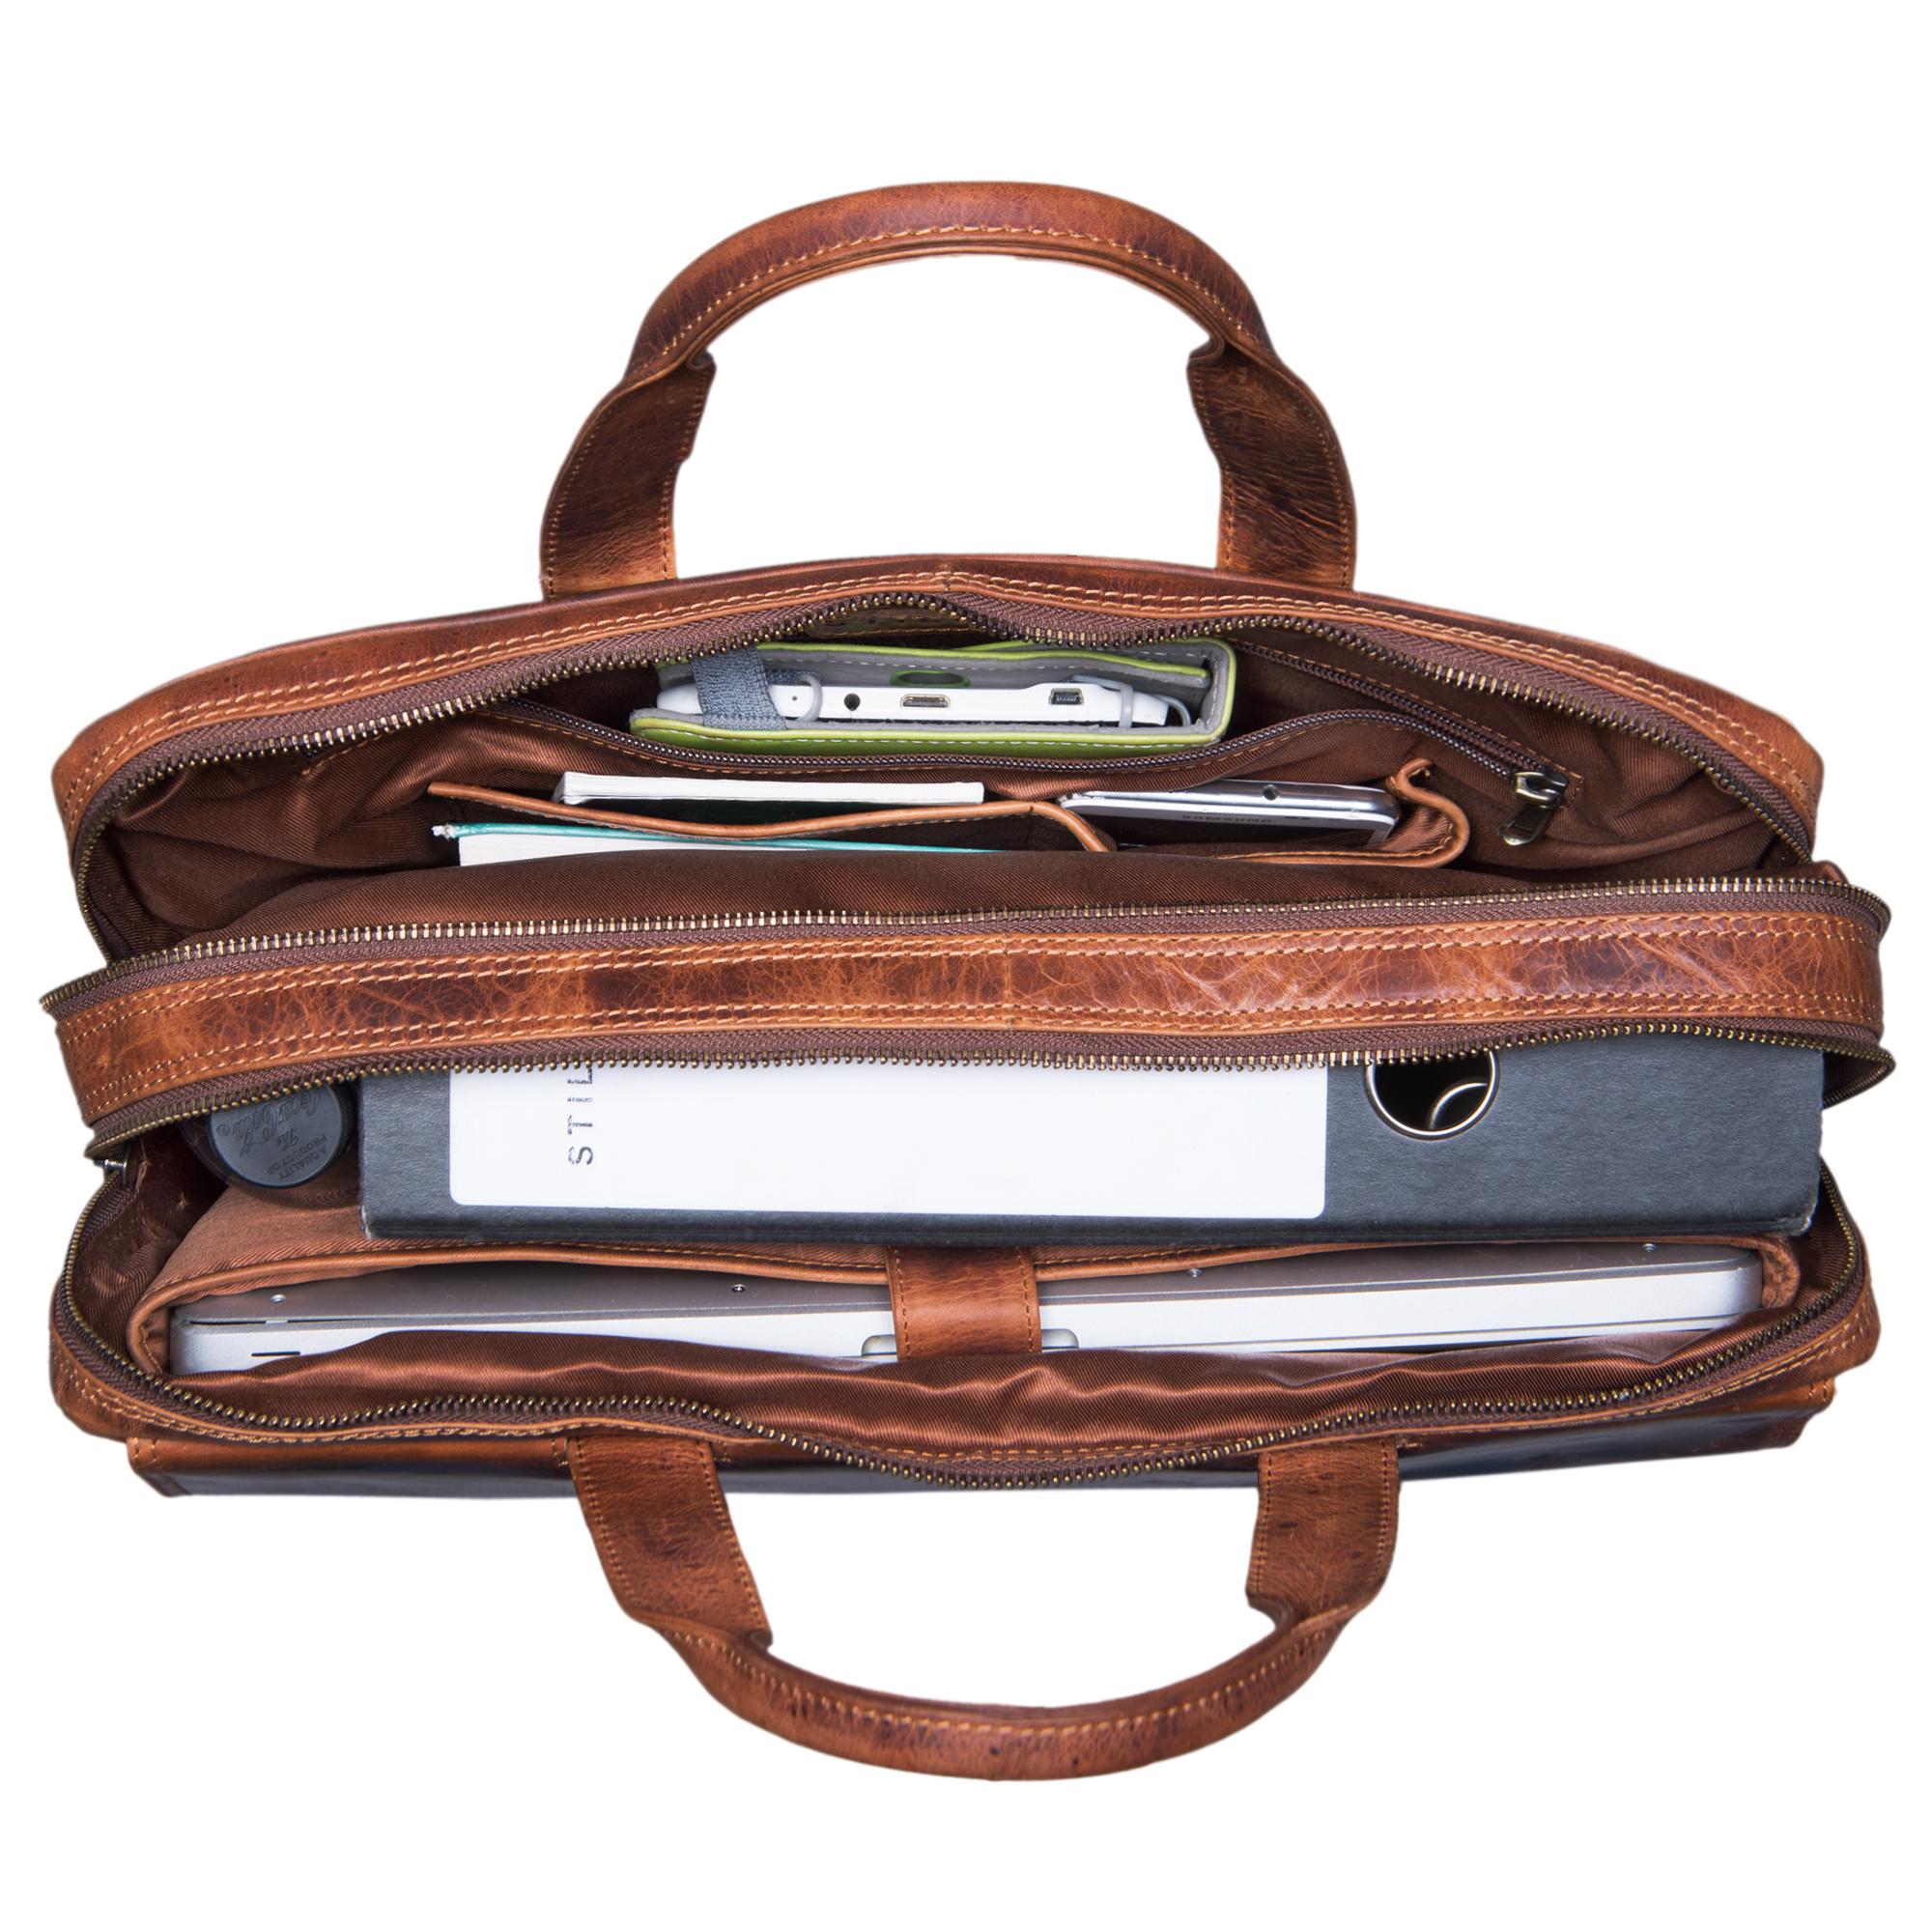 stilord jasper umh ngetasche business herren leder gro e messenger bag f r 15 6 zoll laptop. Black Bedroom Furniture Sets. Home Design Ideas